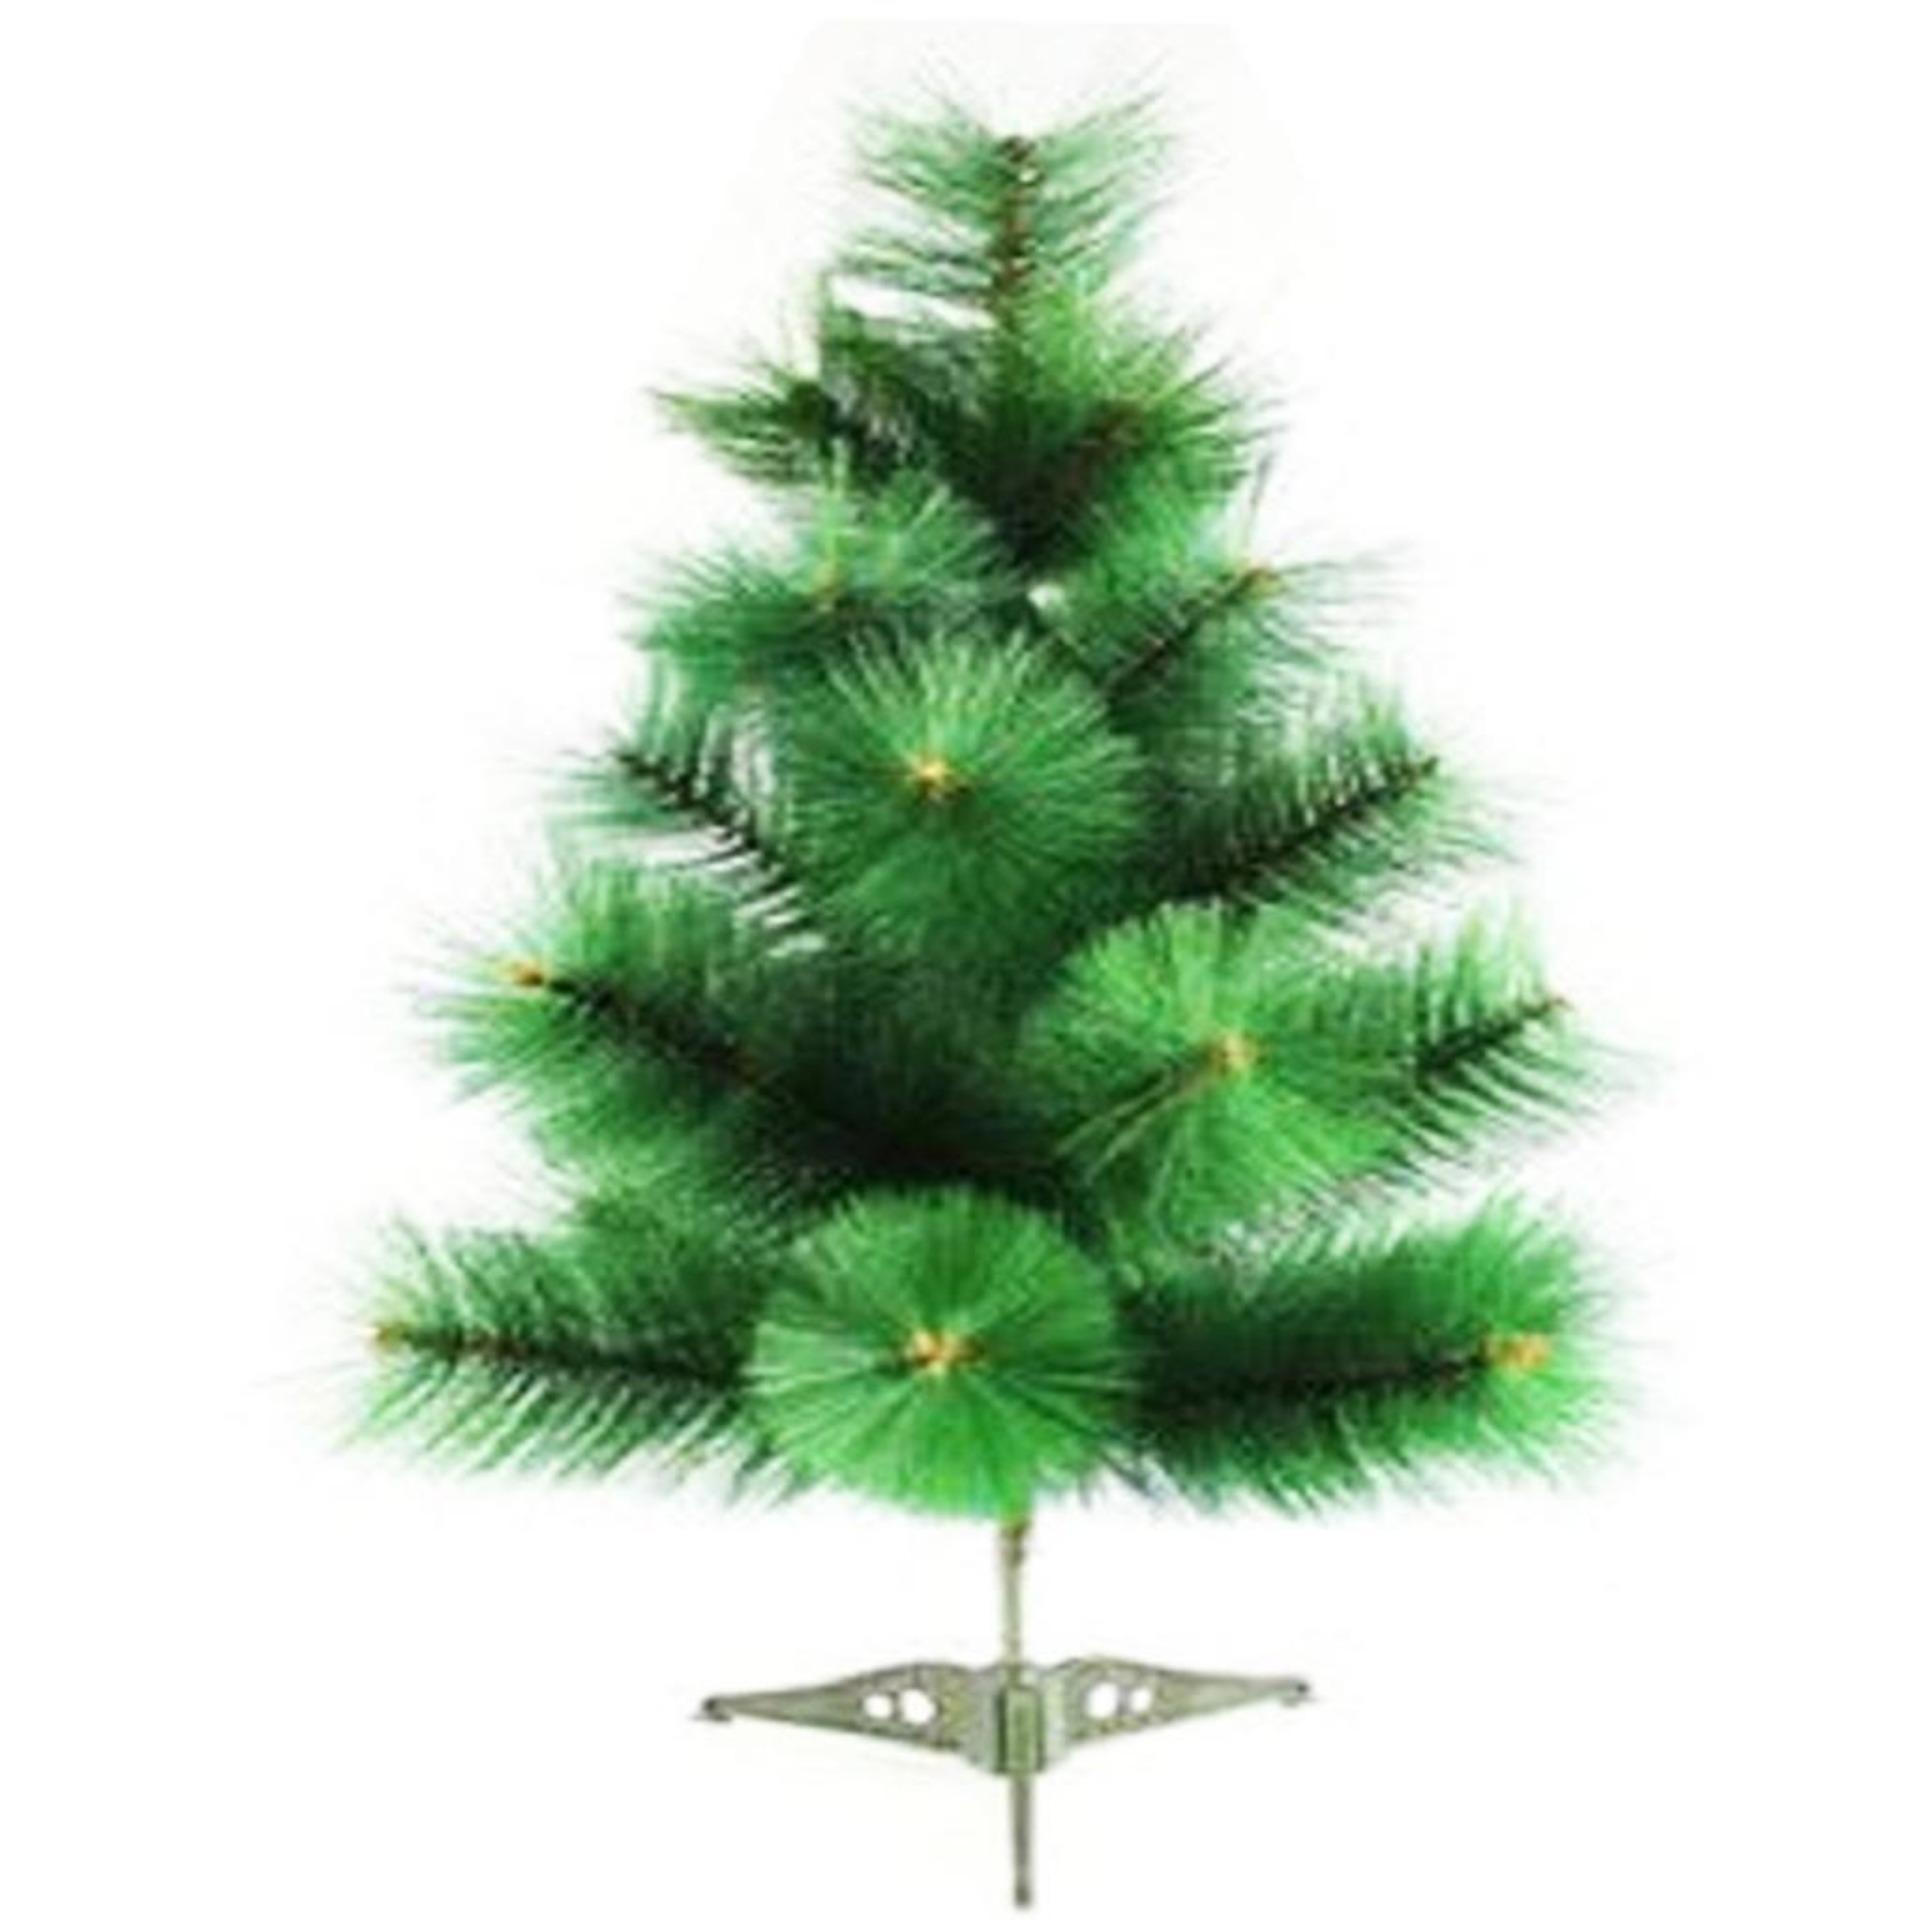 beverlys christmas tree 3ft 42s dark pine and light pine green lazada ph - 3 Ft Christmas Tree